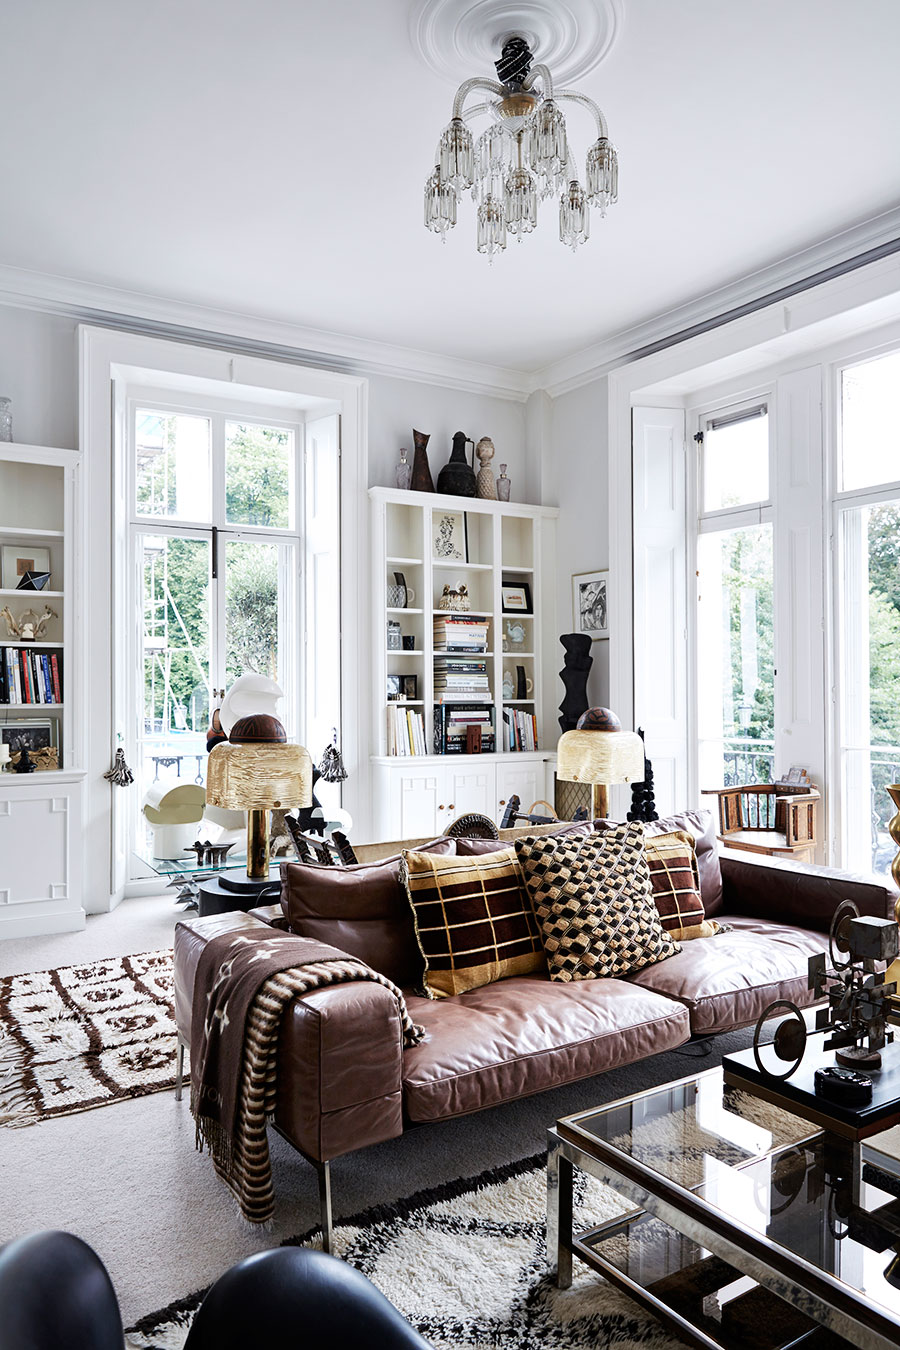 Amazing Boho Chic Interior In London By Malene Birger